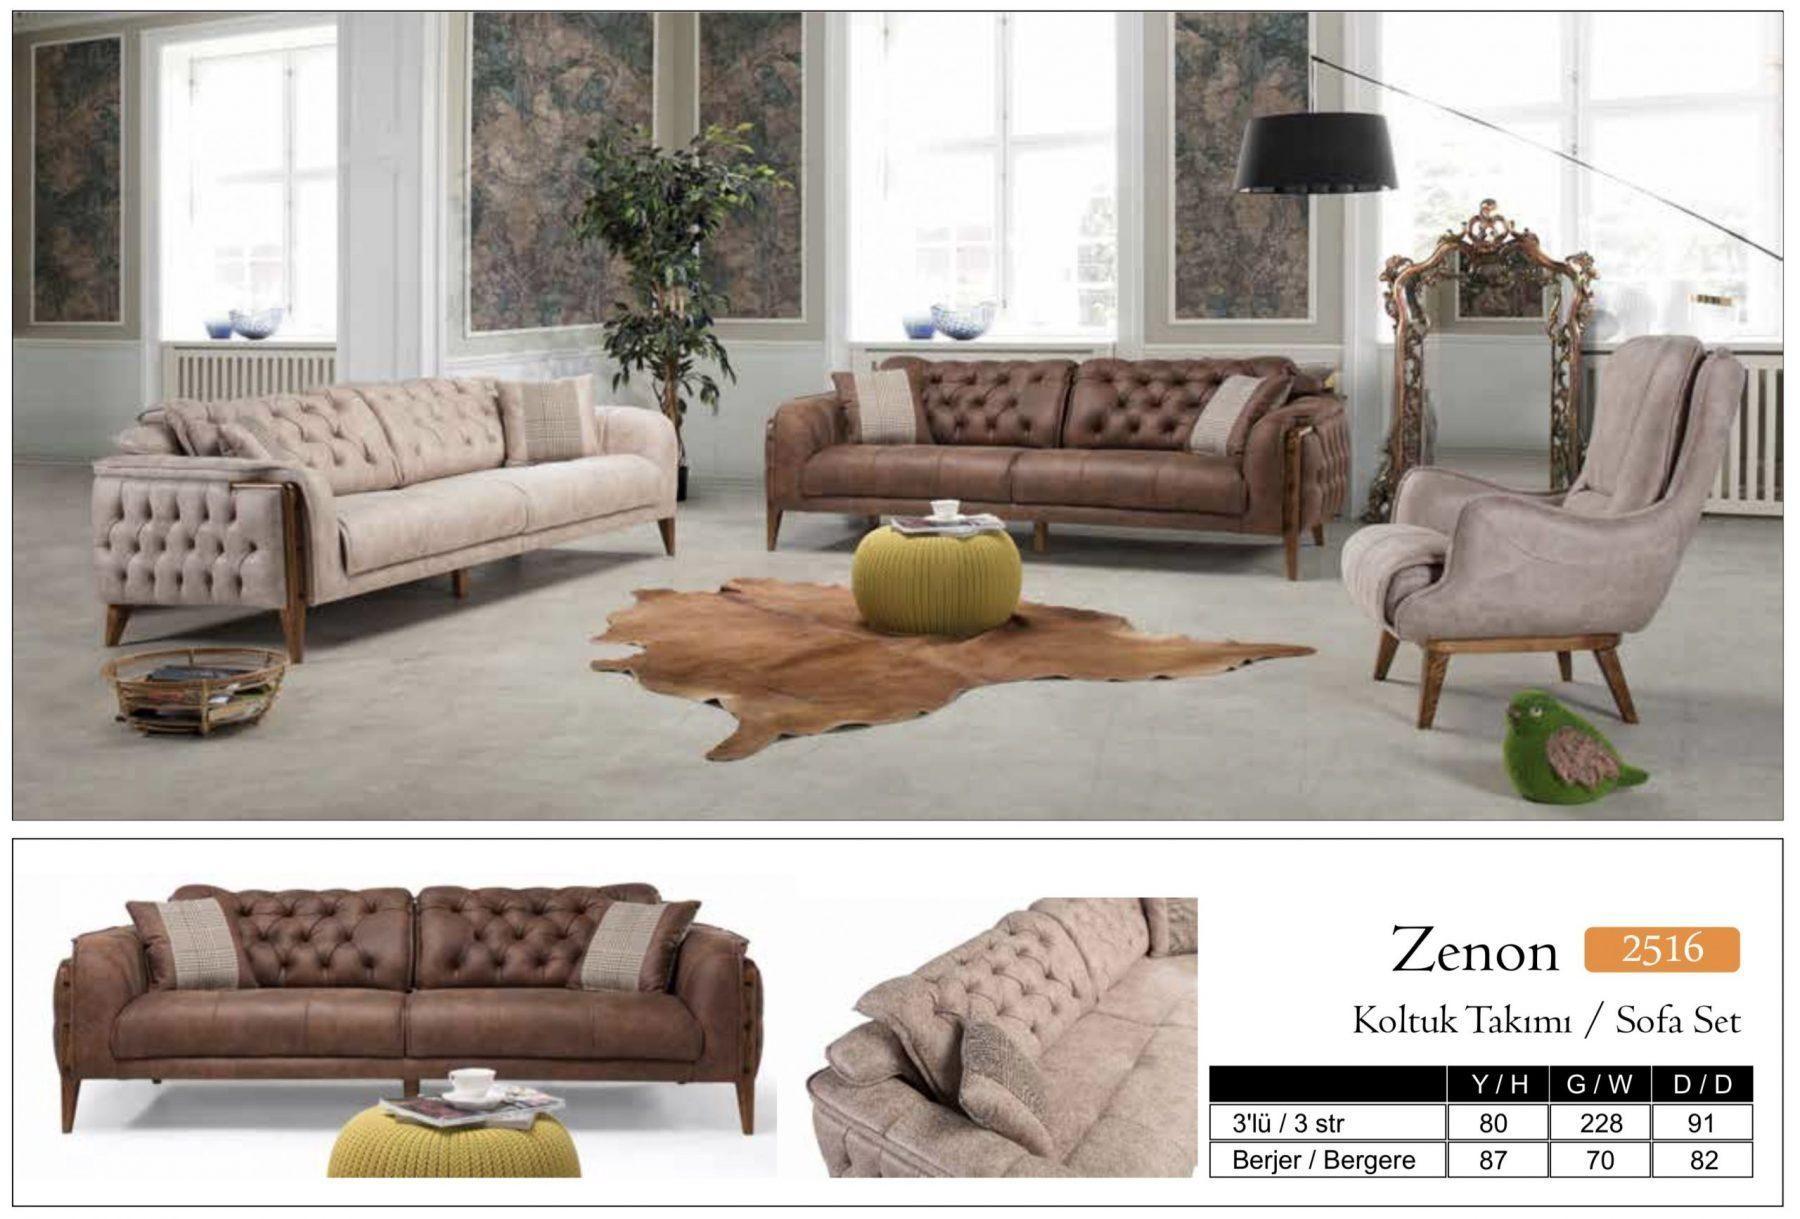 Godina Zenon 2516 Living Room Sofa Set Home Furniture Wholesale Export Turkey Yeniexpo B2b Turkey Wholesale Marketplace